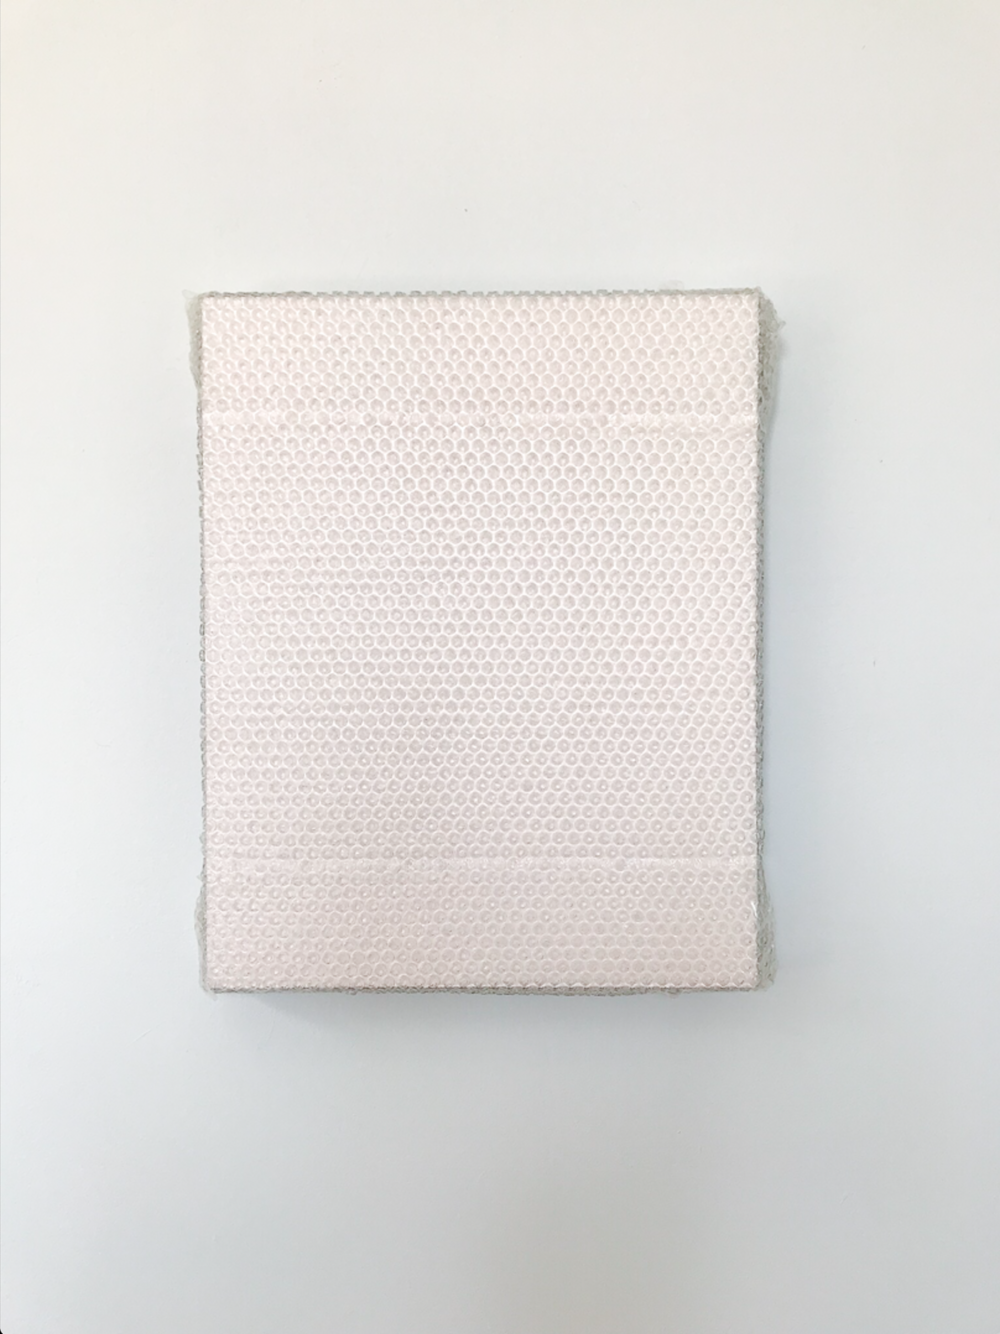 "Pink Monochrome with Bubble Wrap and Packing Tape,  2018, Acrylique sur toile de lin, 20"" x 16""."